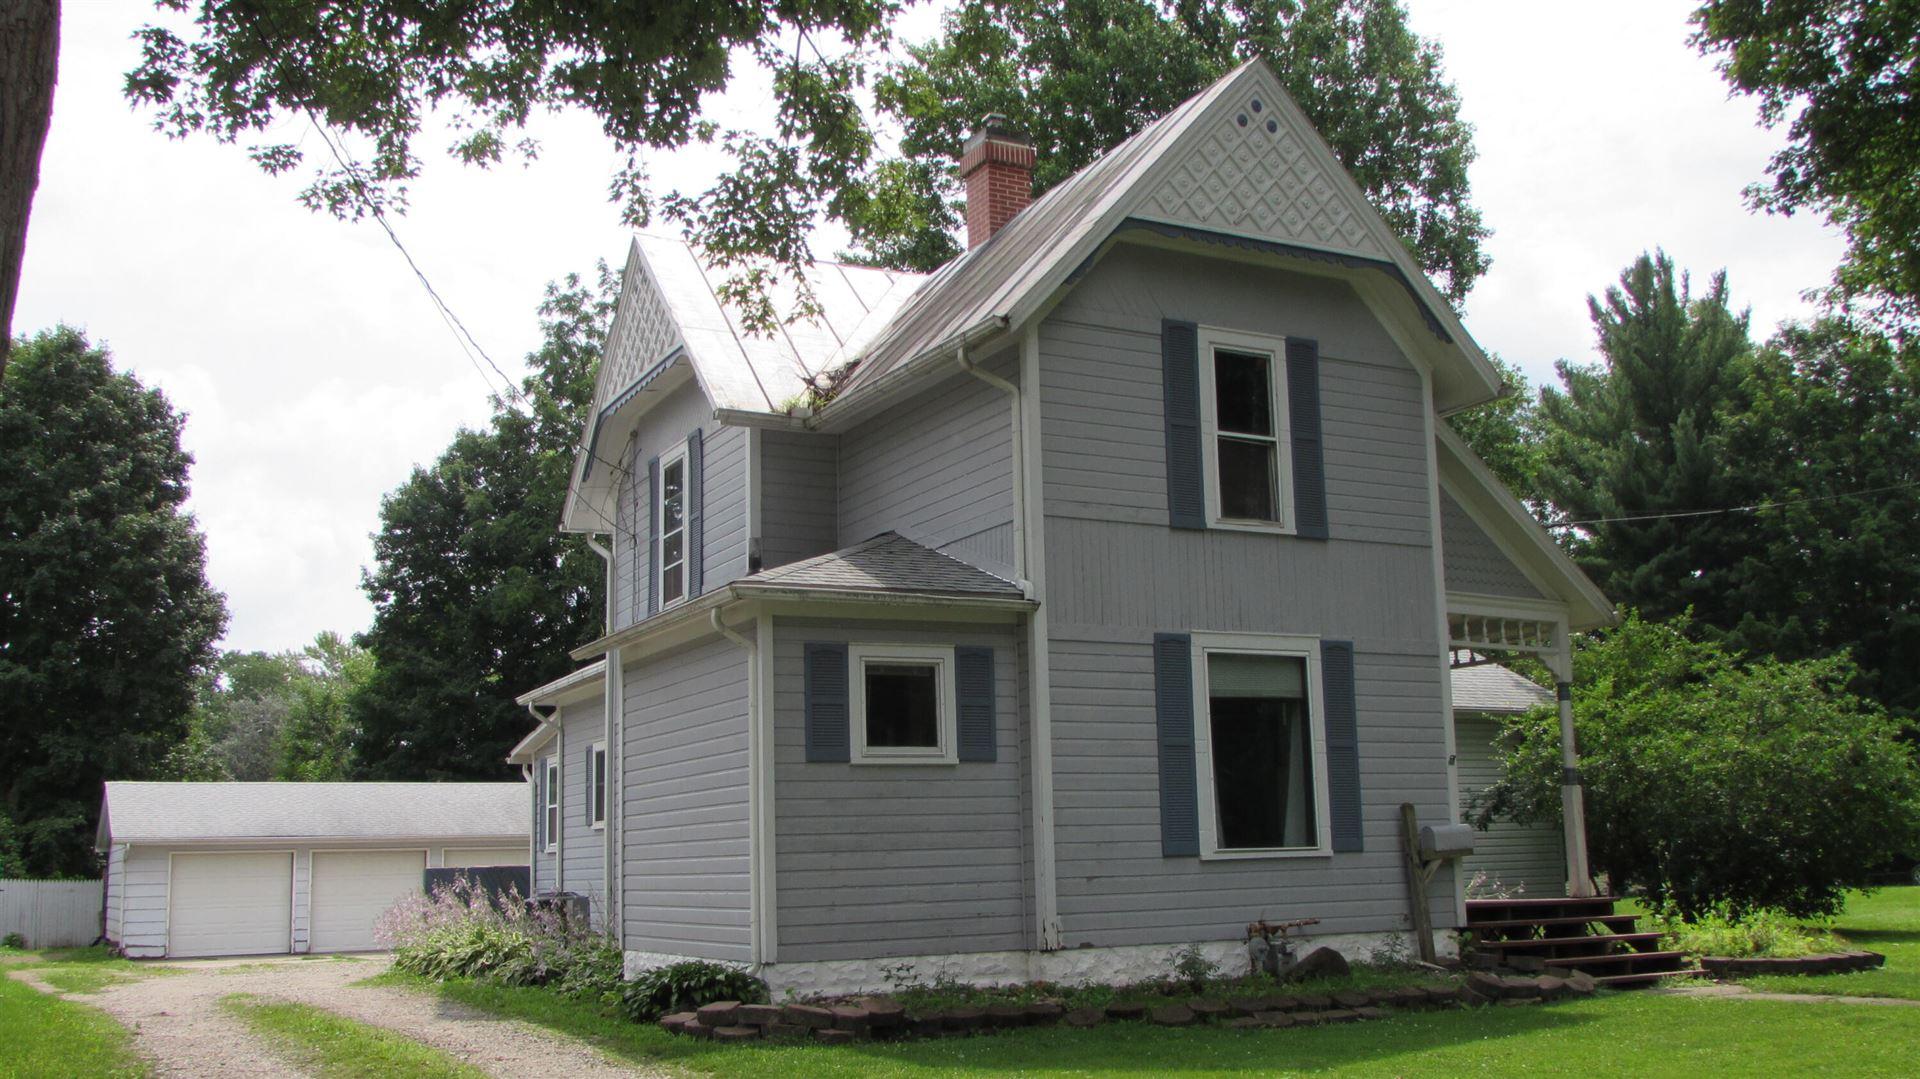 98 N Fremont Avenue, Coldwater, MI 49036 - MLS#: 21033646